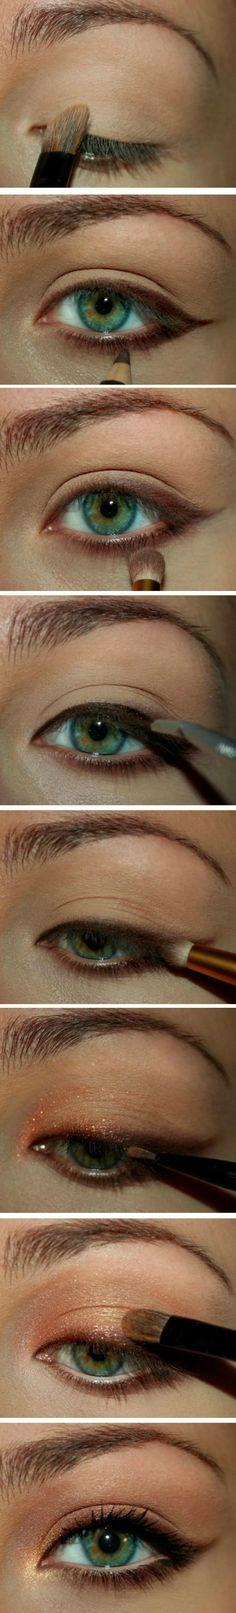 Hair/makeup/skin